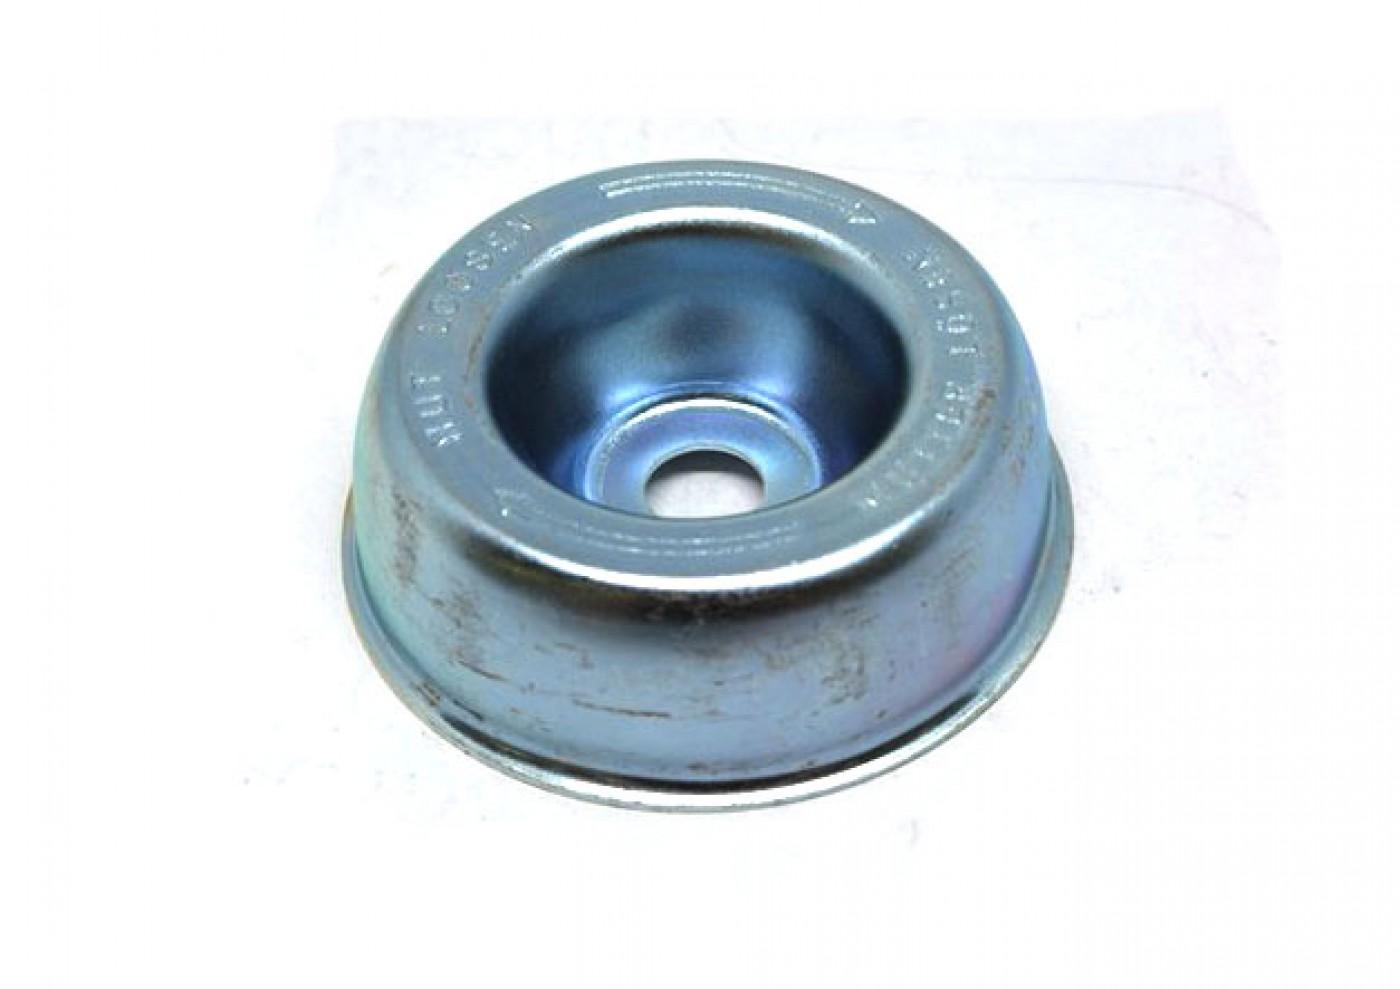 Miska pod kotouč Stihl FS100 FS120 FS130 FS200 FS250 FS44 FS65 FS80 FS85 - 4126 713 3100